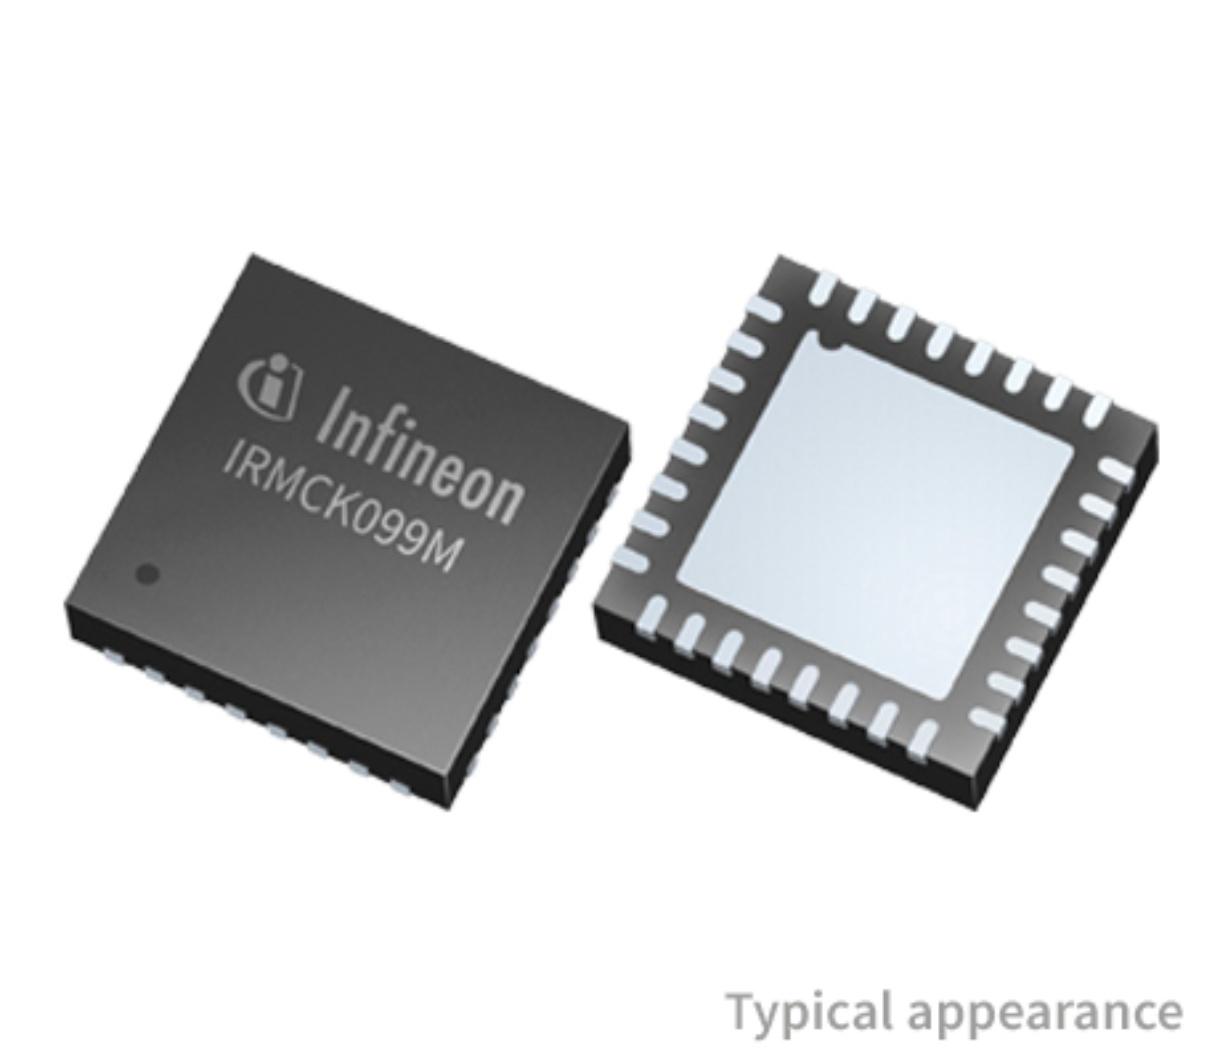 IRMCK099M - Infineon Technologies